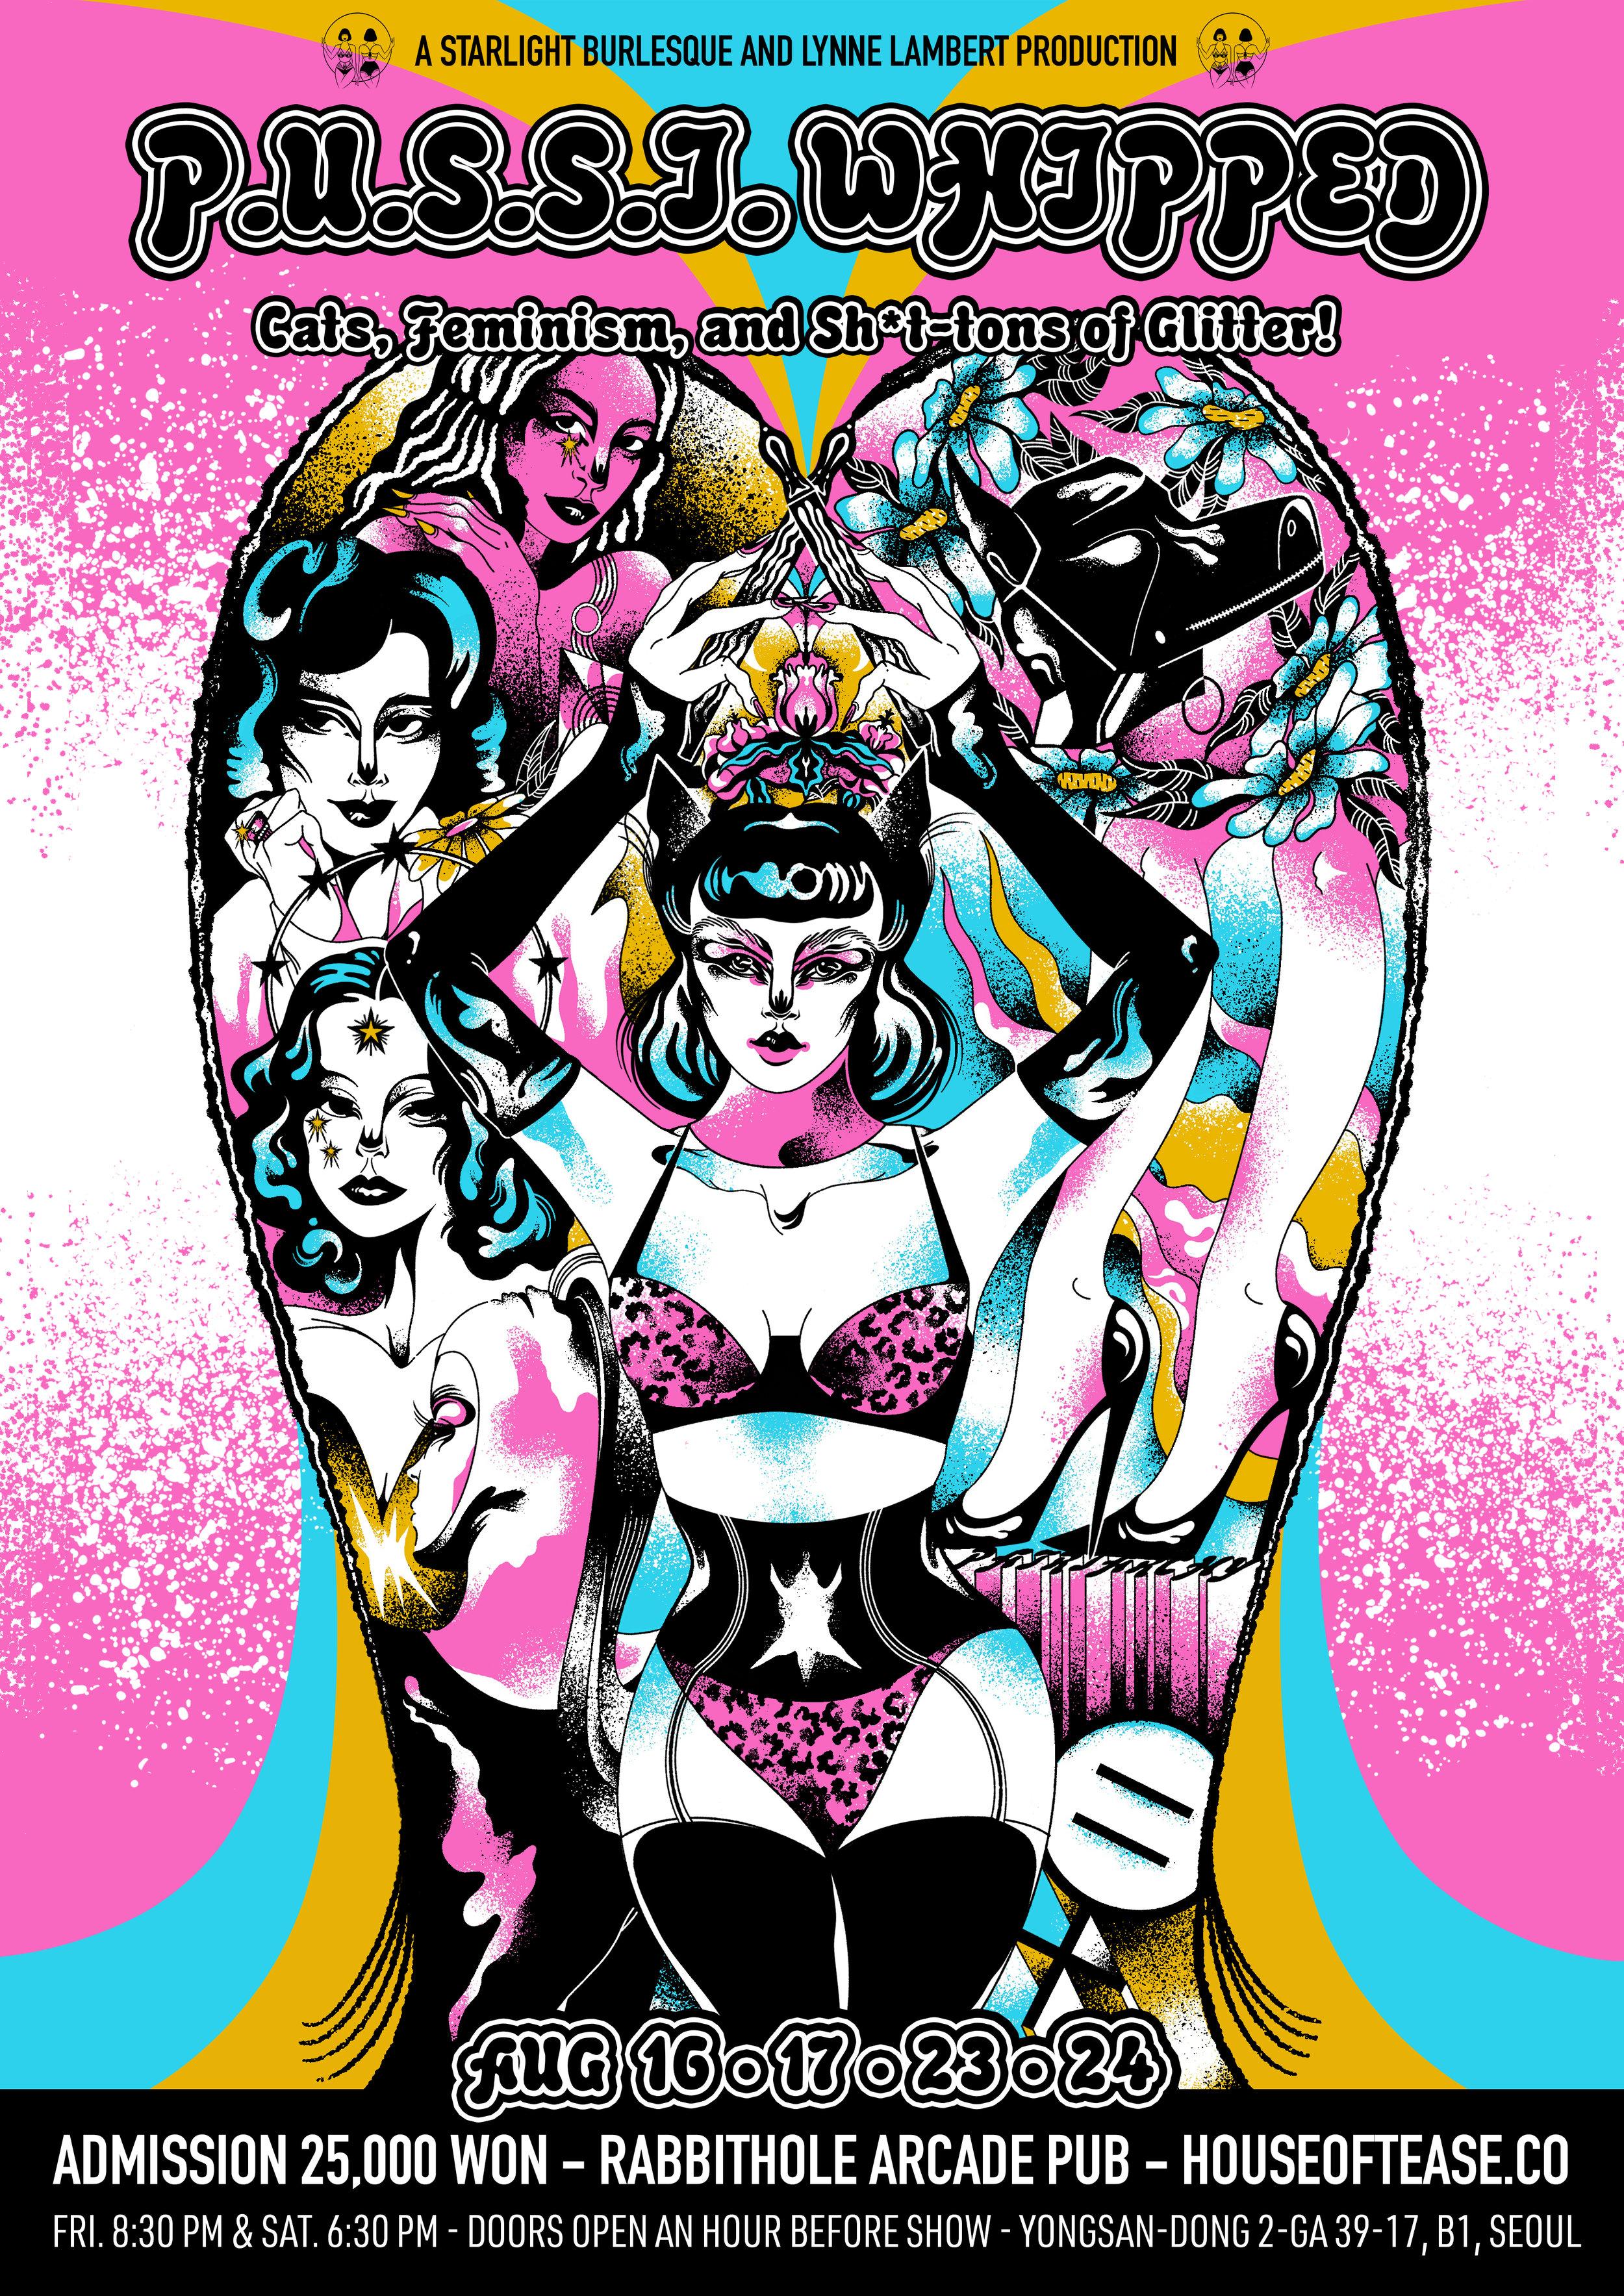 P.U.S.S.I. Whipped - Cat, Feminism, & Sh*t-tons of Glitter!